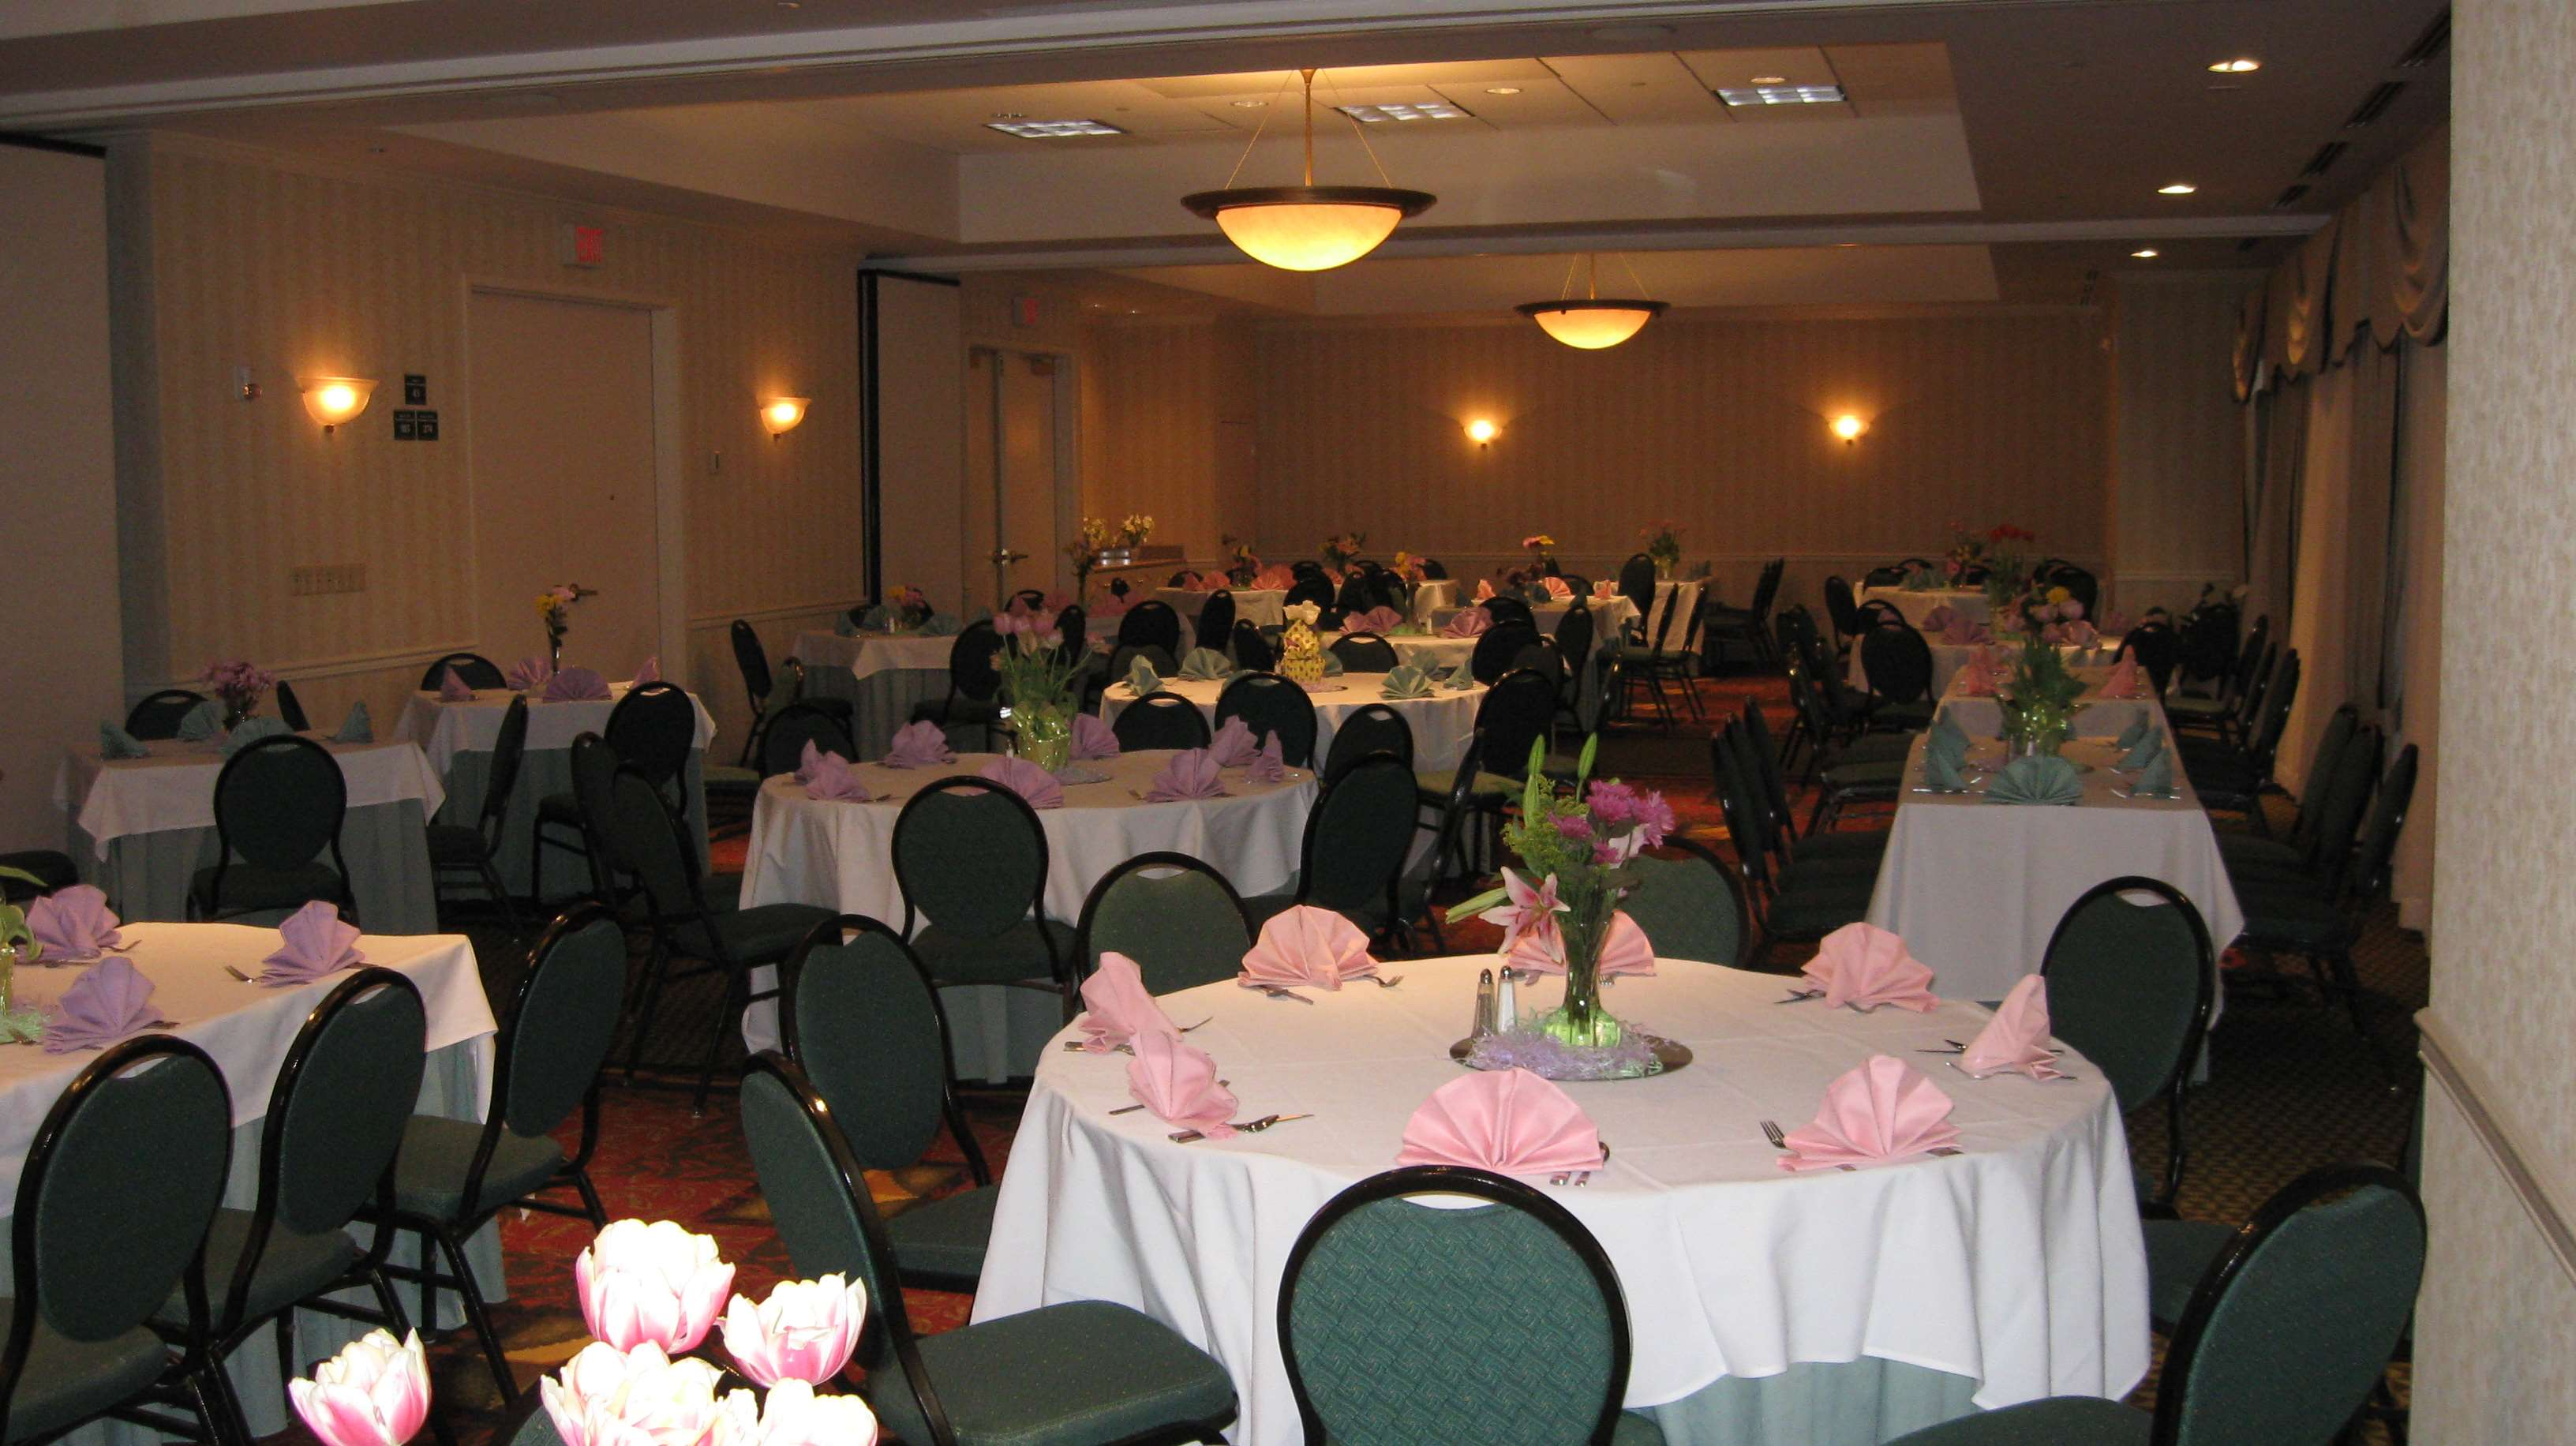 Hilton Garden Inn Elmira/Corning image 29